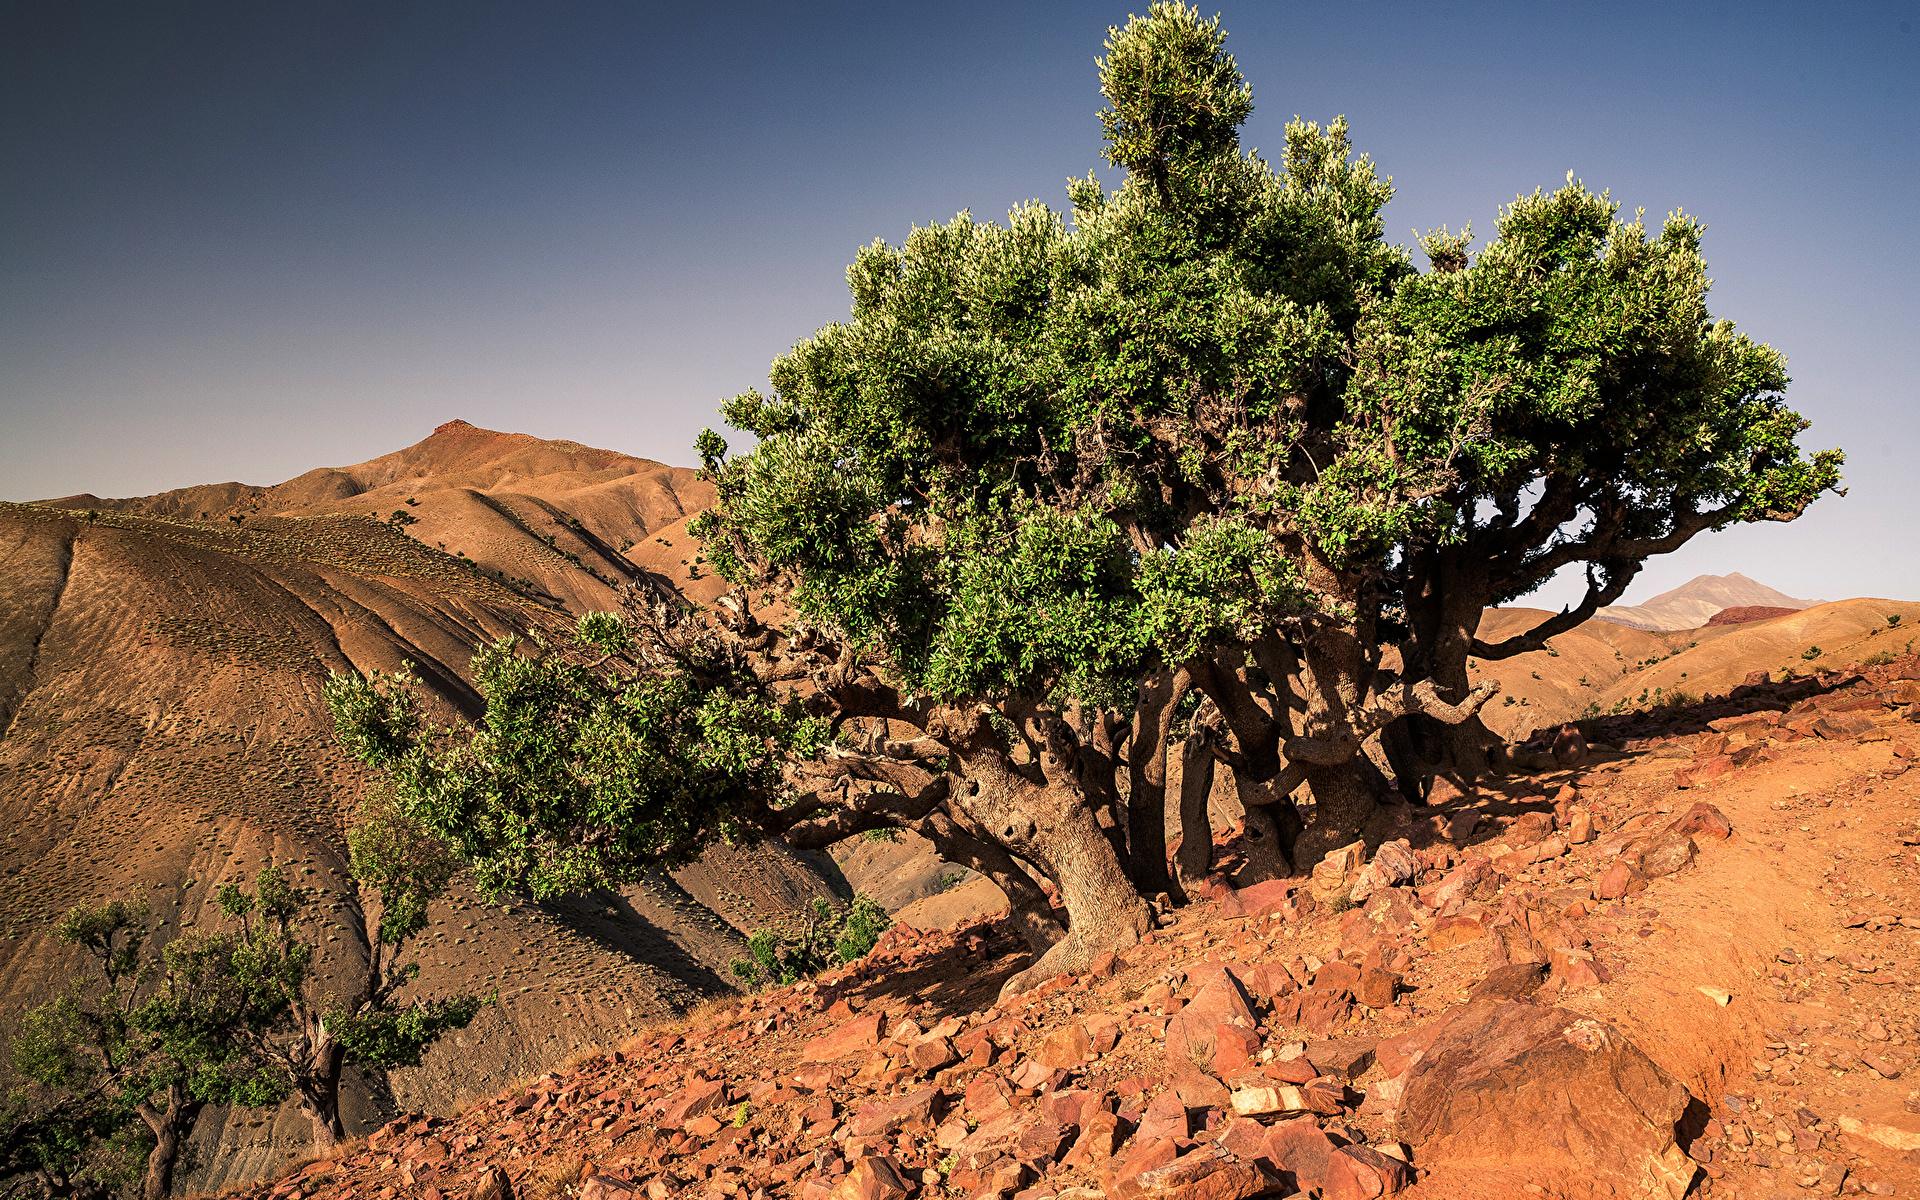 Картинка Африка Марокко Toufrine, Tadla-Azilal Природа Камень дерева 1920x1200 Камни дерево Деревья деревьев